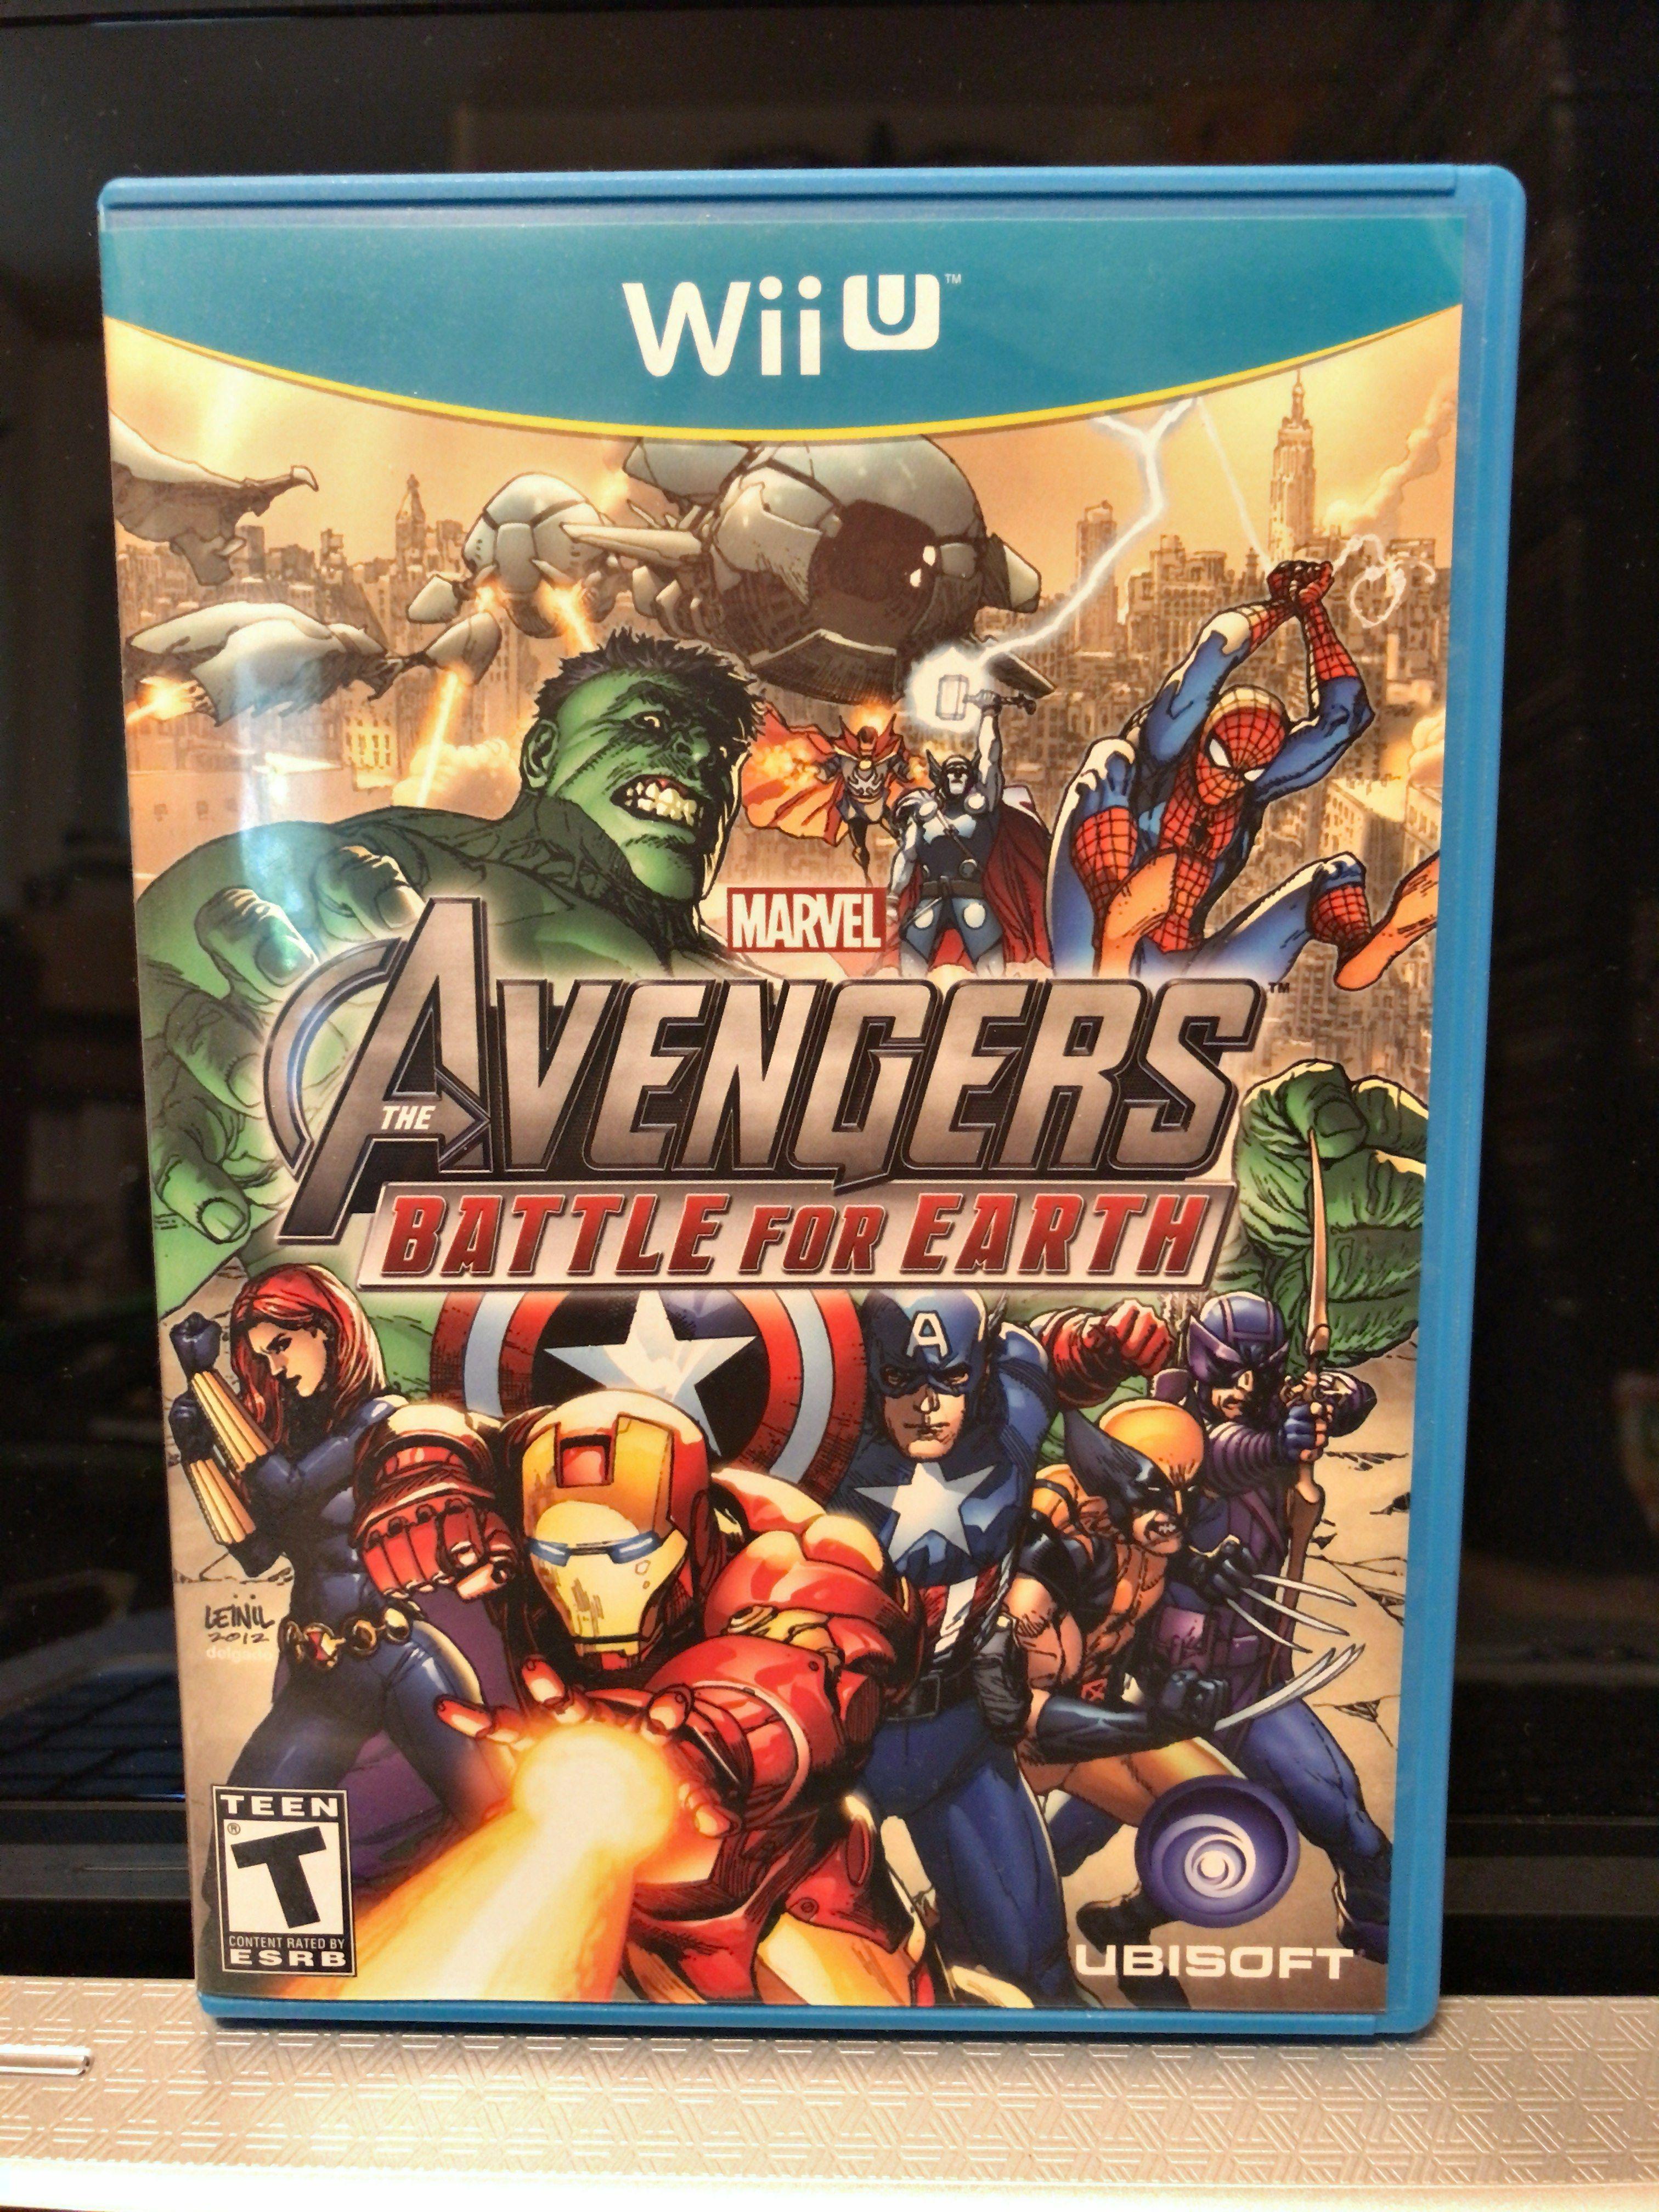 Nintendo Wii U The Avengers battle for earth Nintendo